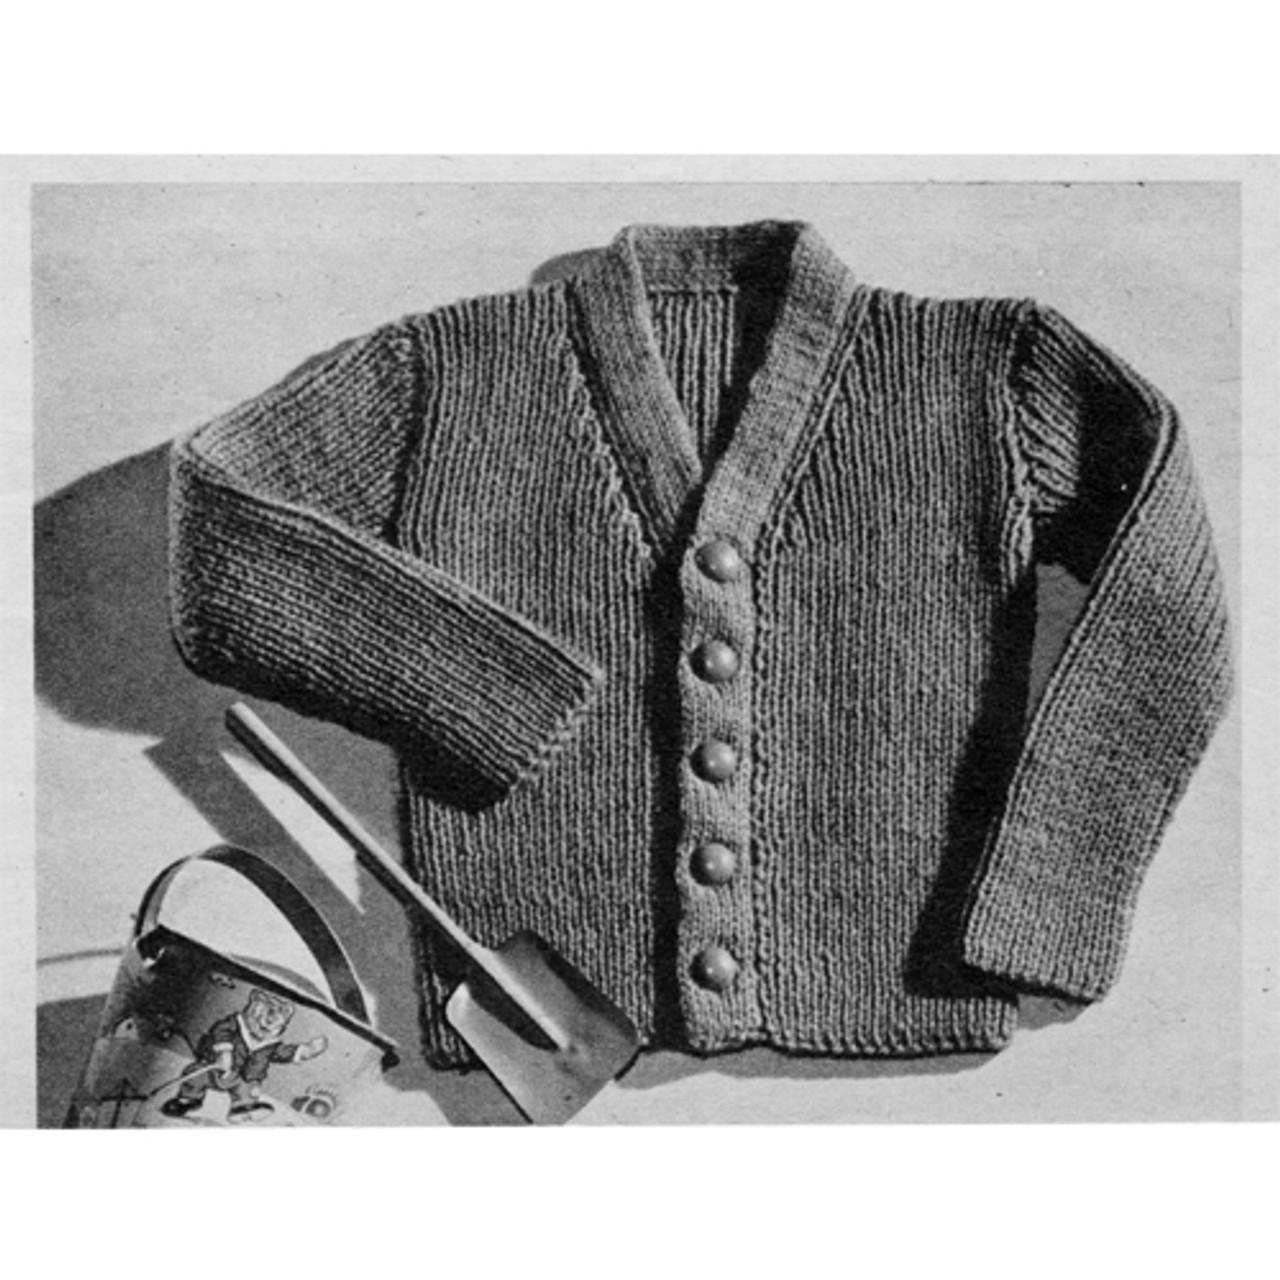 Baby Knitted Rib Cardigan Pattern